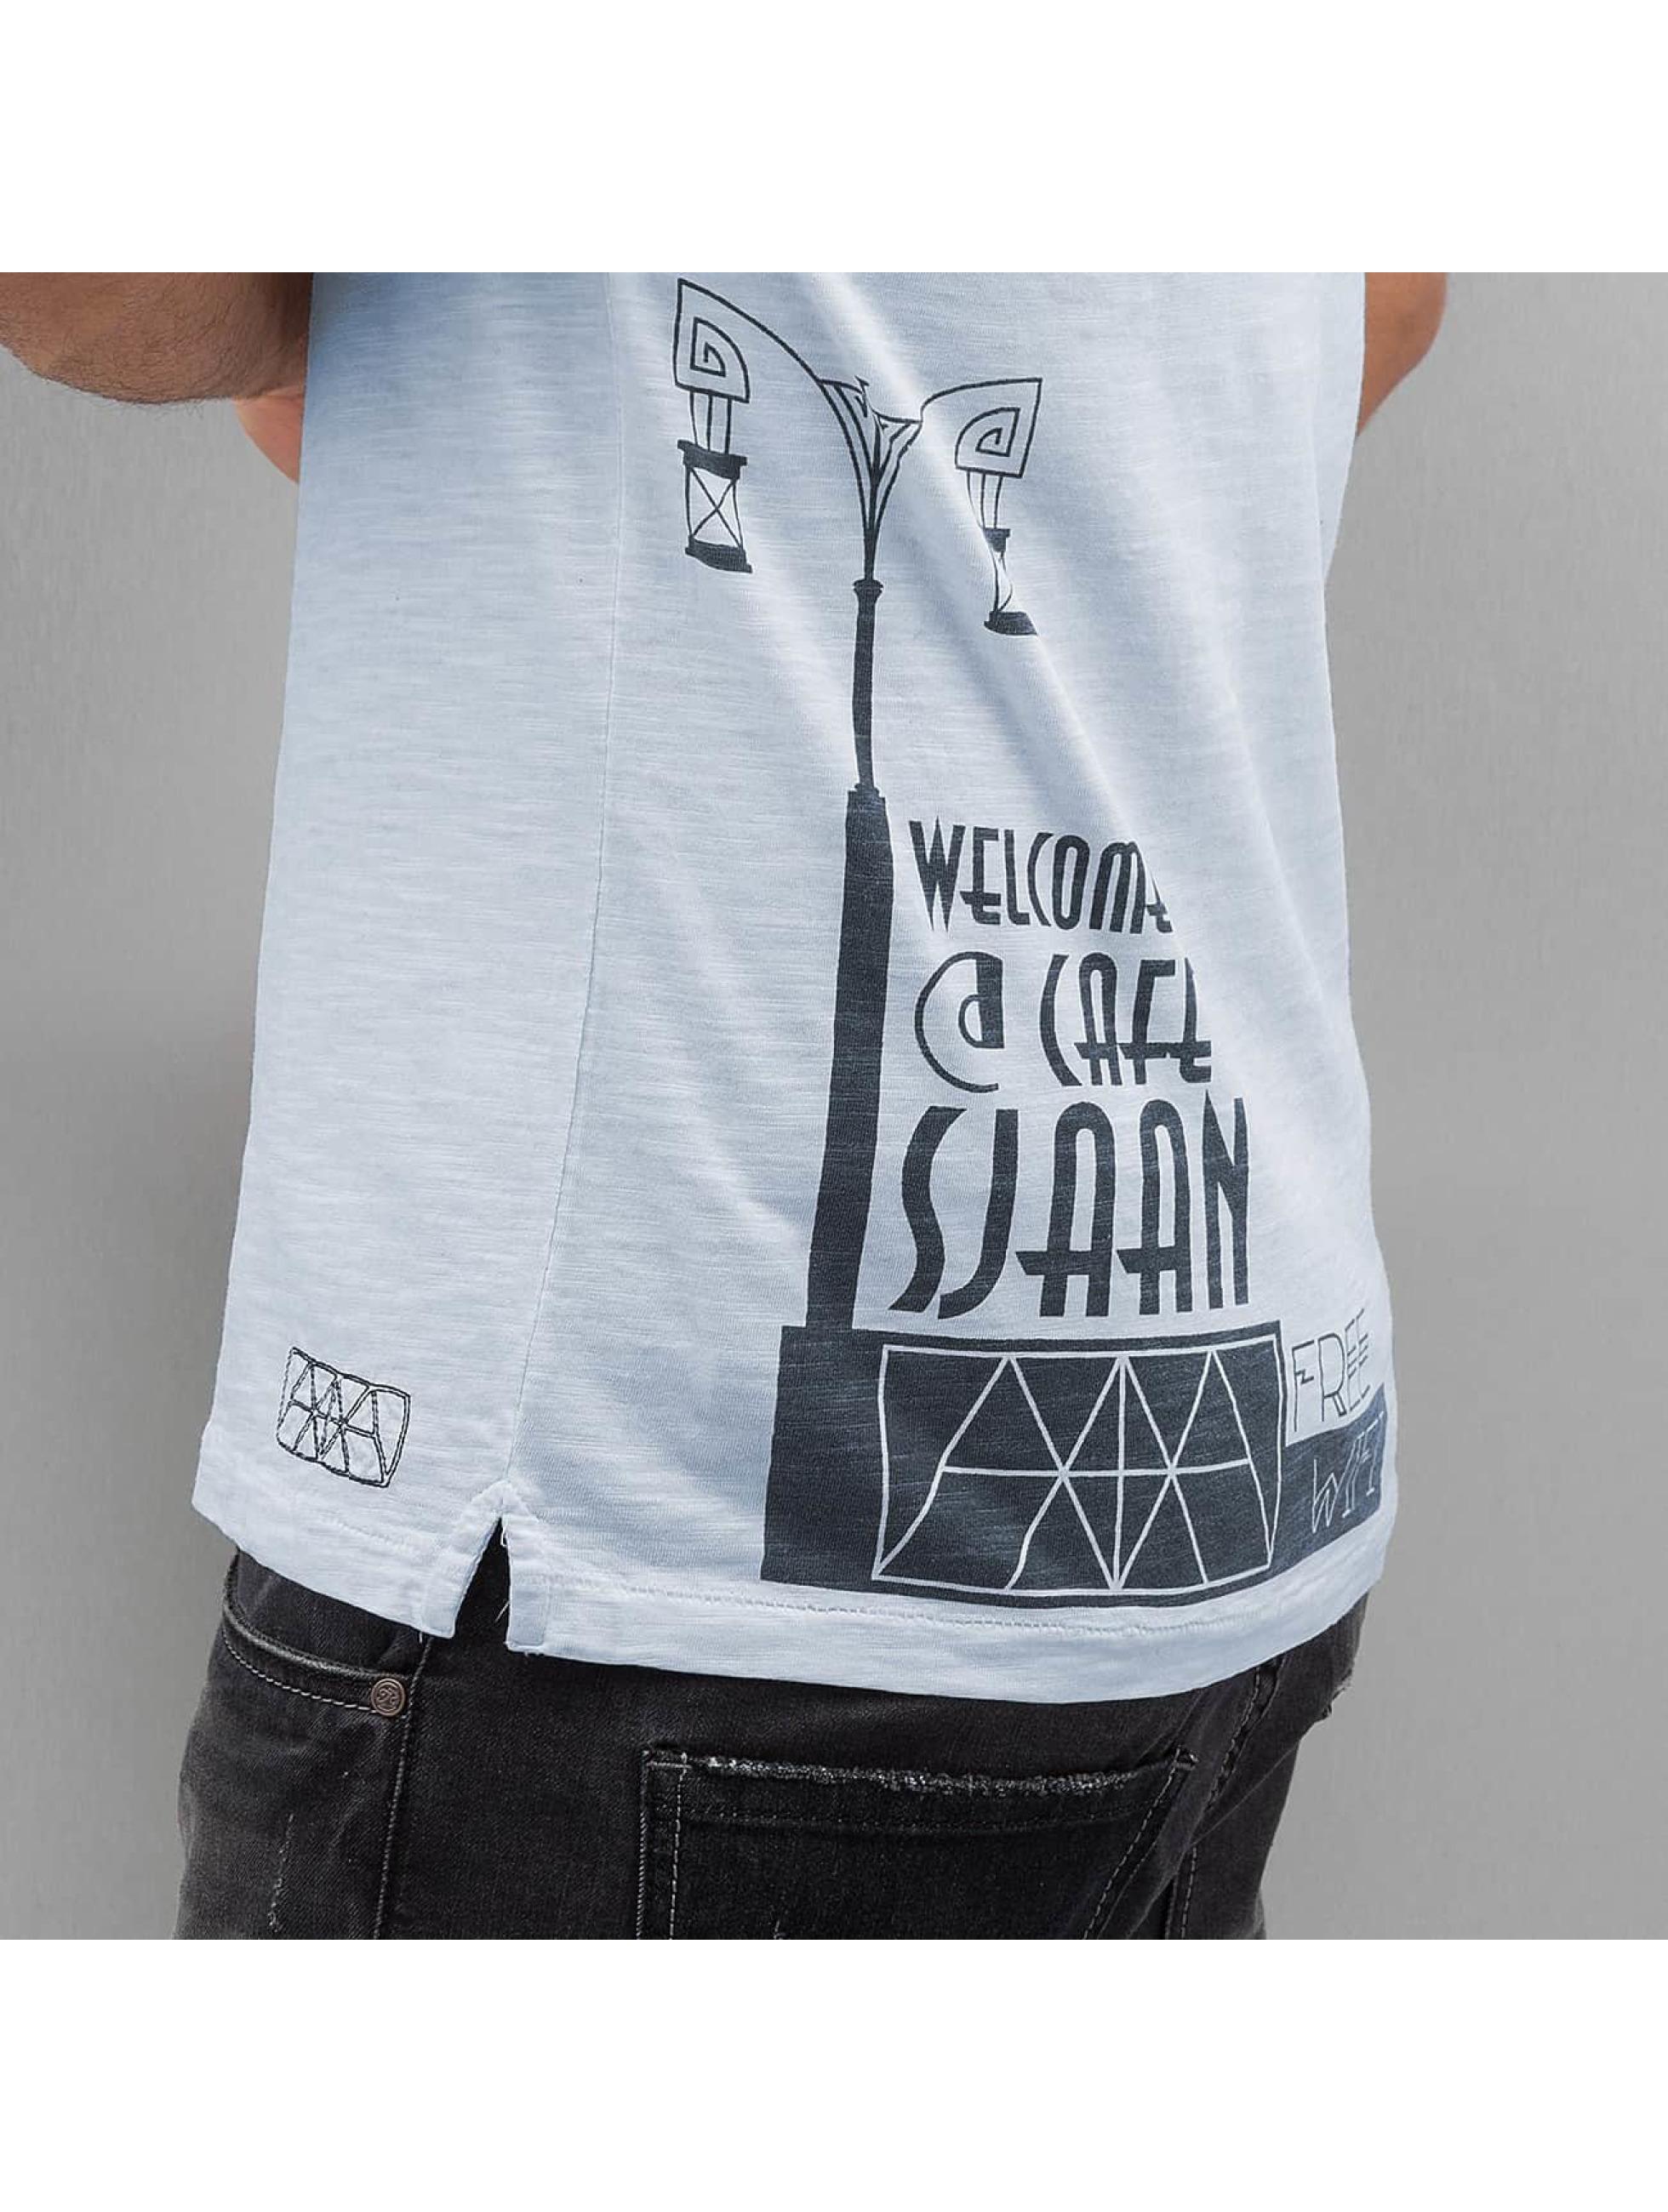 Amsterdenim T-paidat Tommy Sjaan sininen